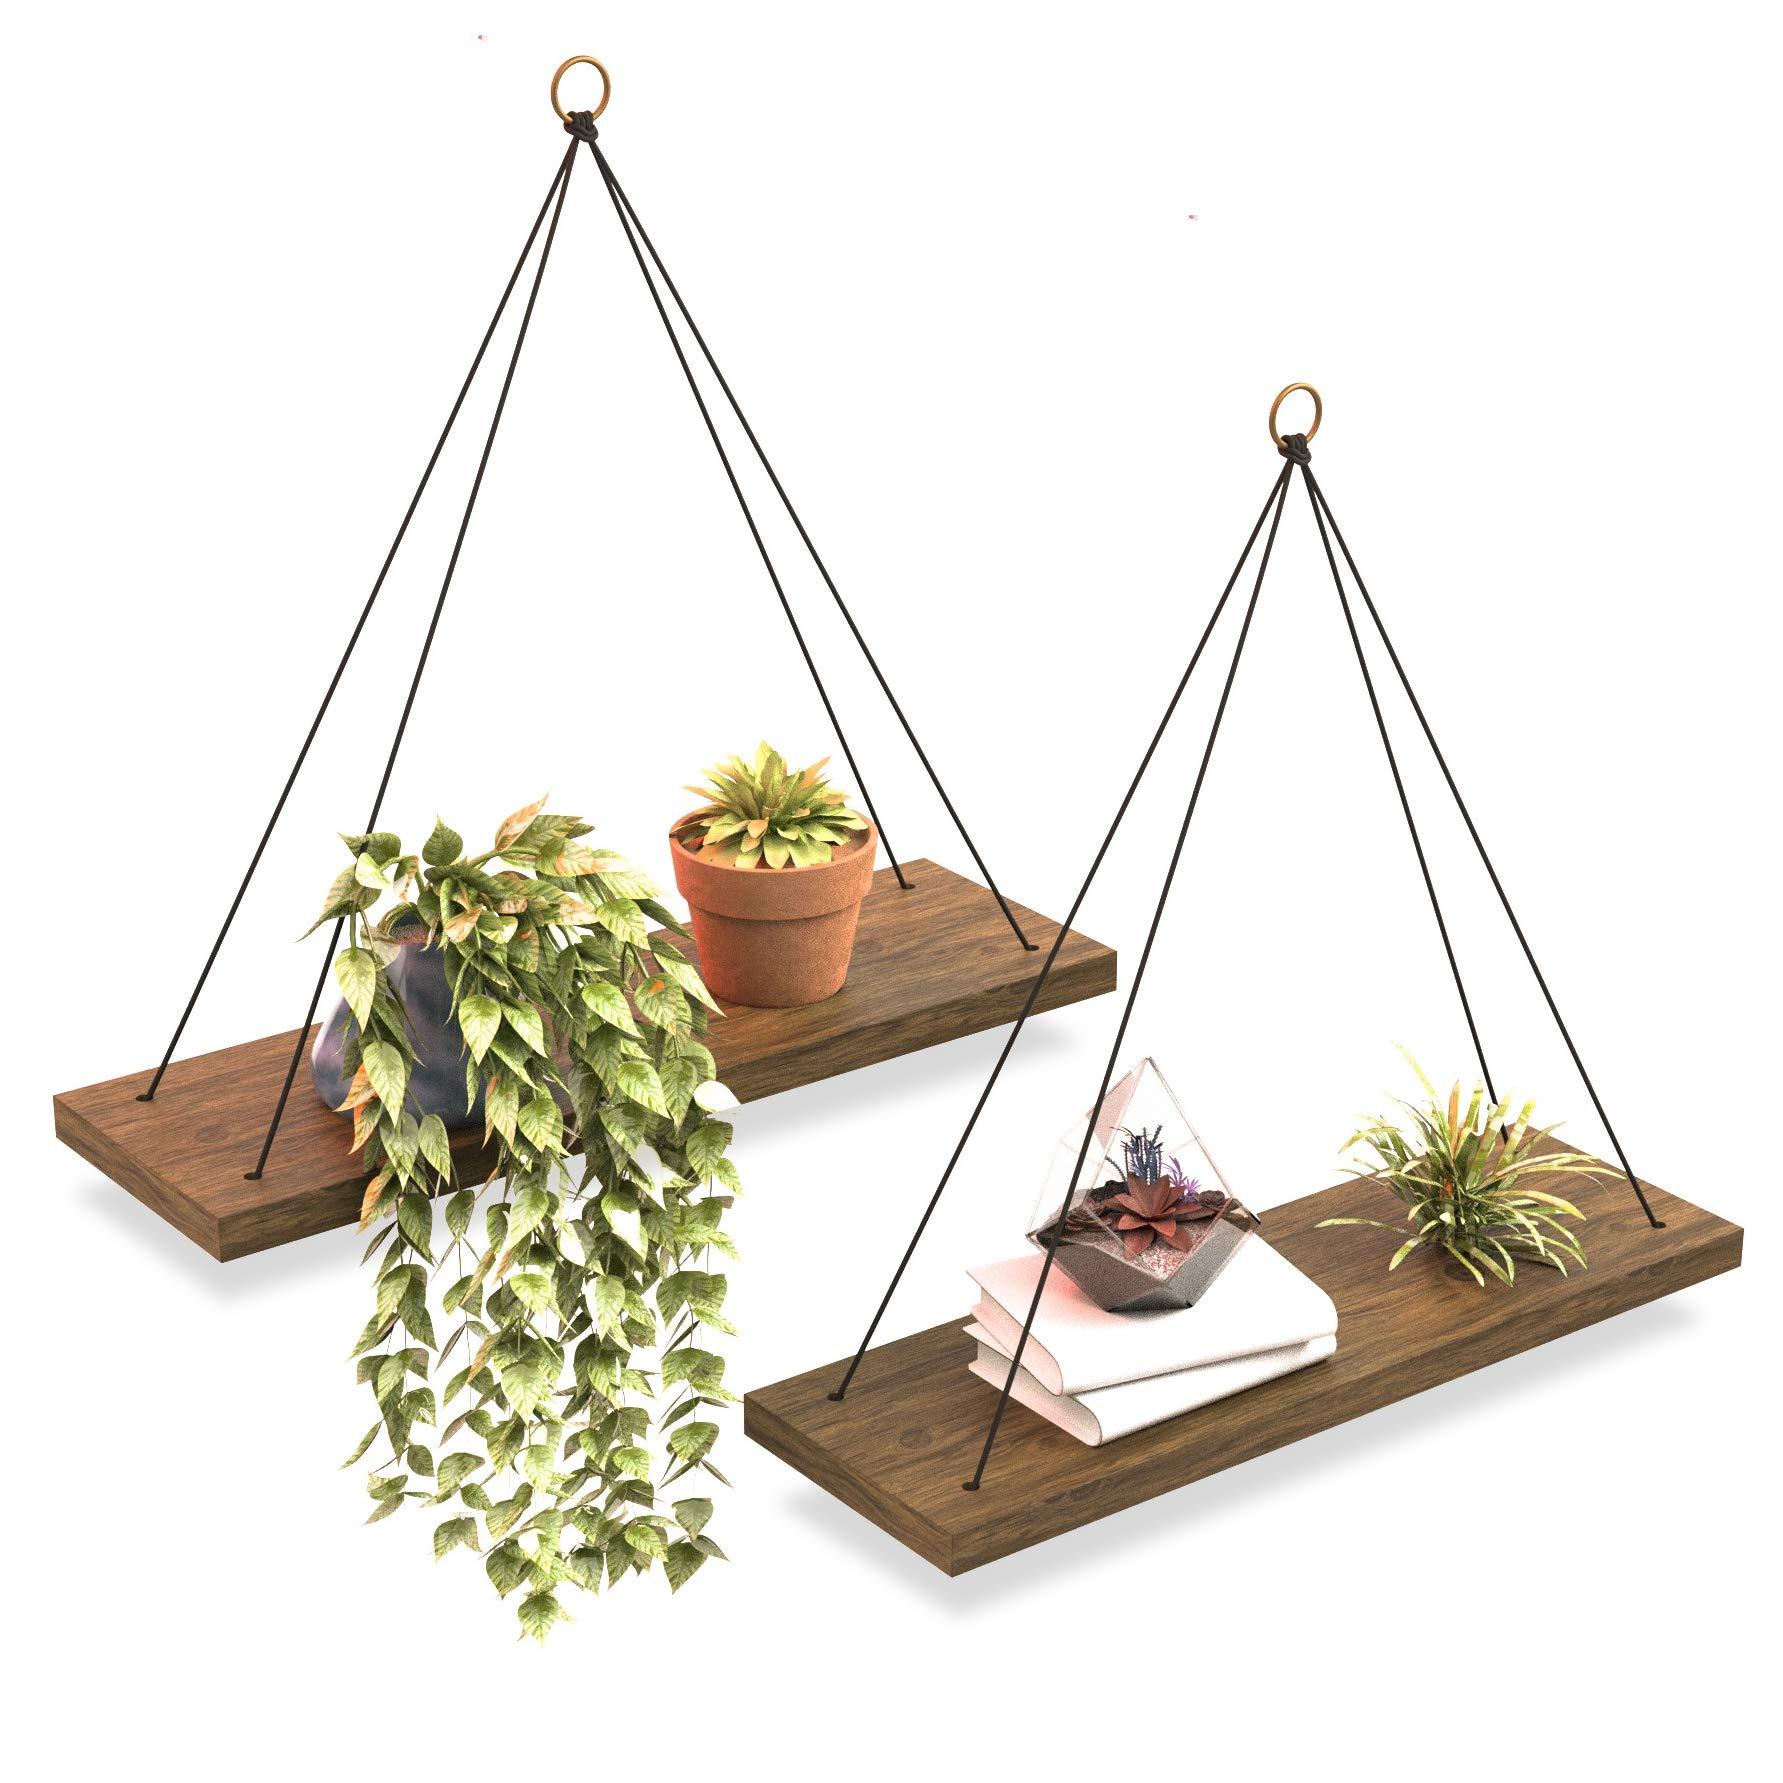 Boho Wall Hanging Shelf - Set of 2 Wood Hanging Shelves for Wall - Farmhouse Rope Shelves for Bedroom Living Room Bathroom - Rustic Wood Shelves - Hanging Wall Shelf - Triangle Floating Wood Shelves by Omysa